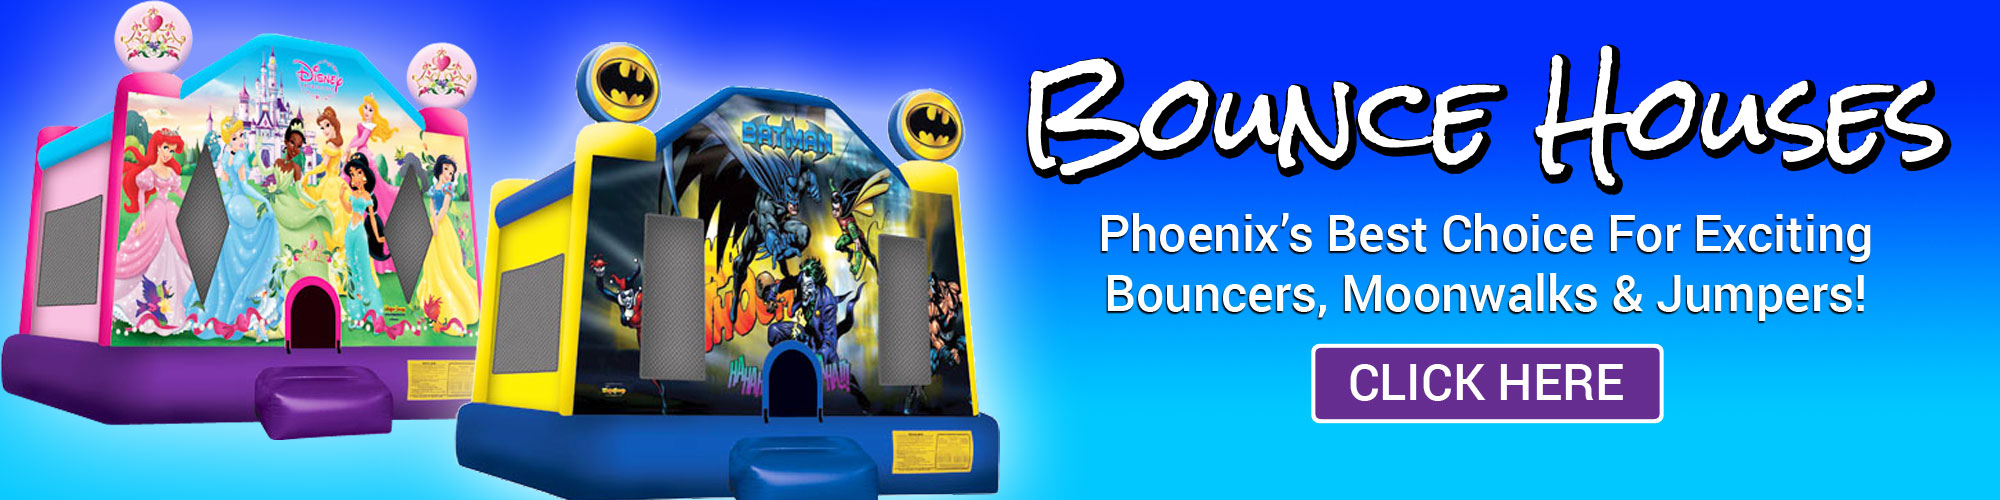 Phoenix Bounce House Rentals